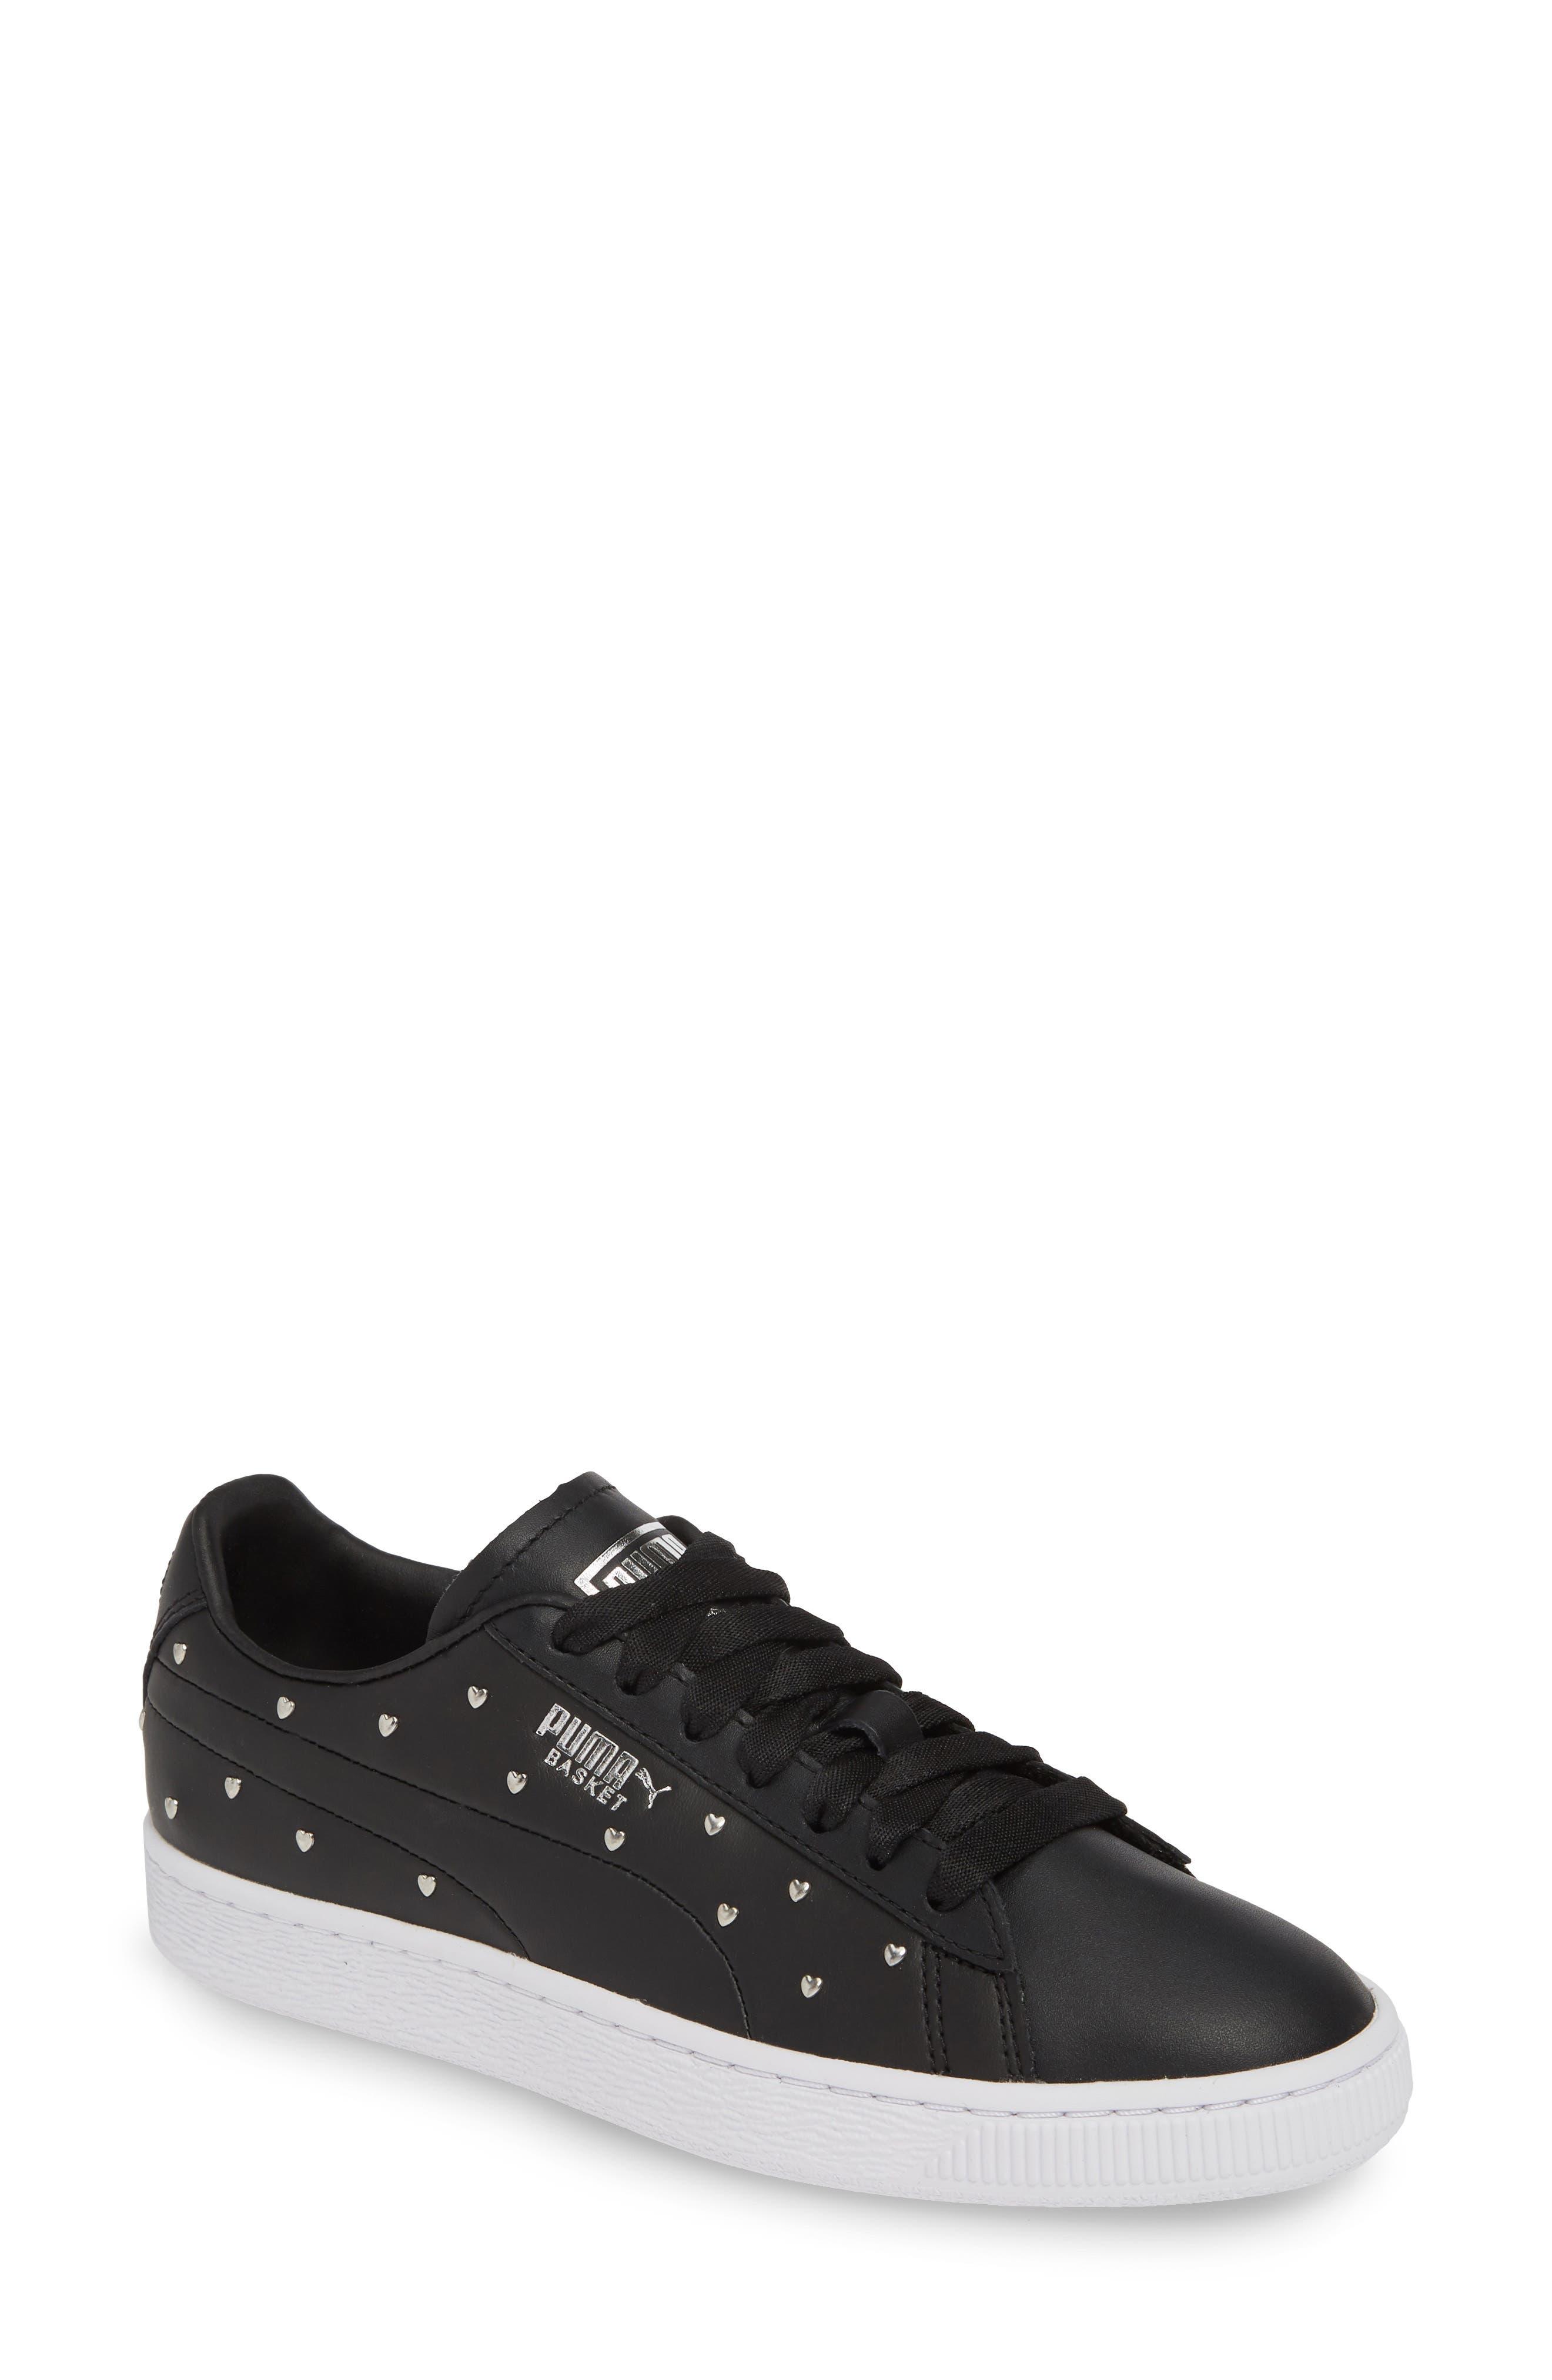 Puma Basket Studs Sneaker- Black